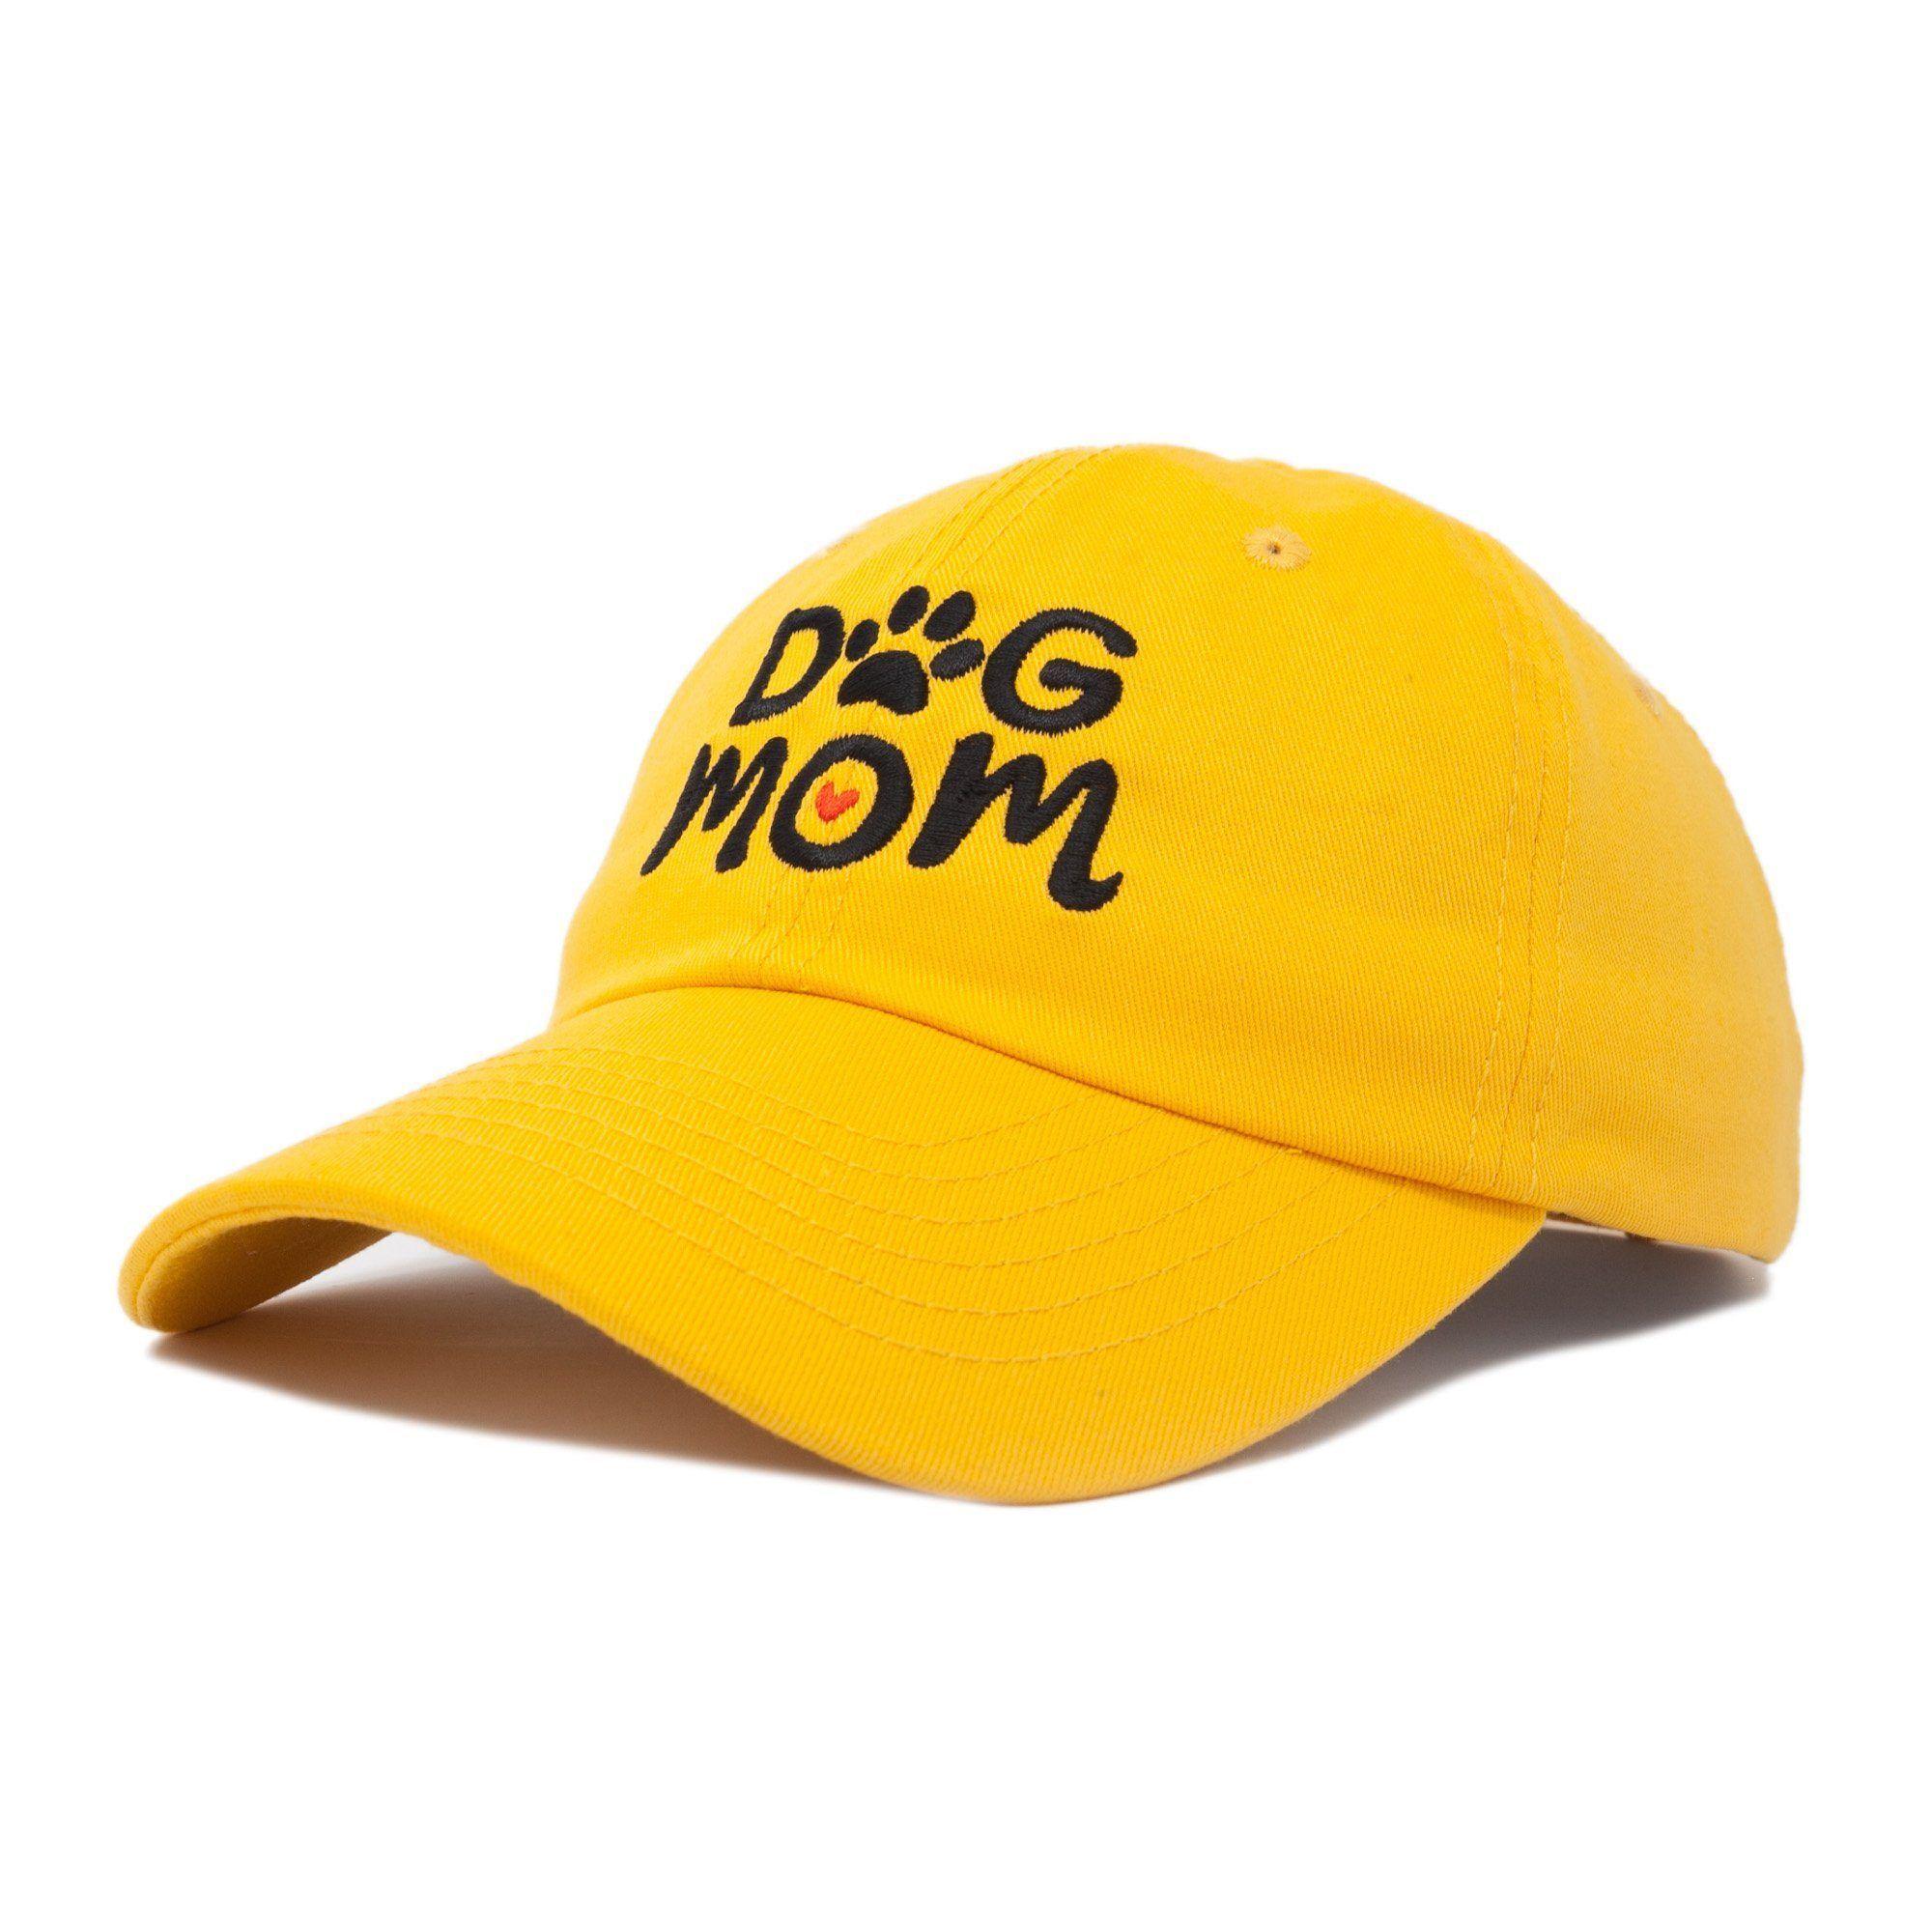 DALIX Dog Mom Baseball Cap Women s Hats Dad Hat in 2019  37460291b0c